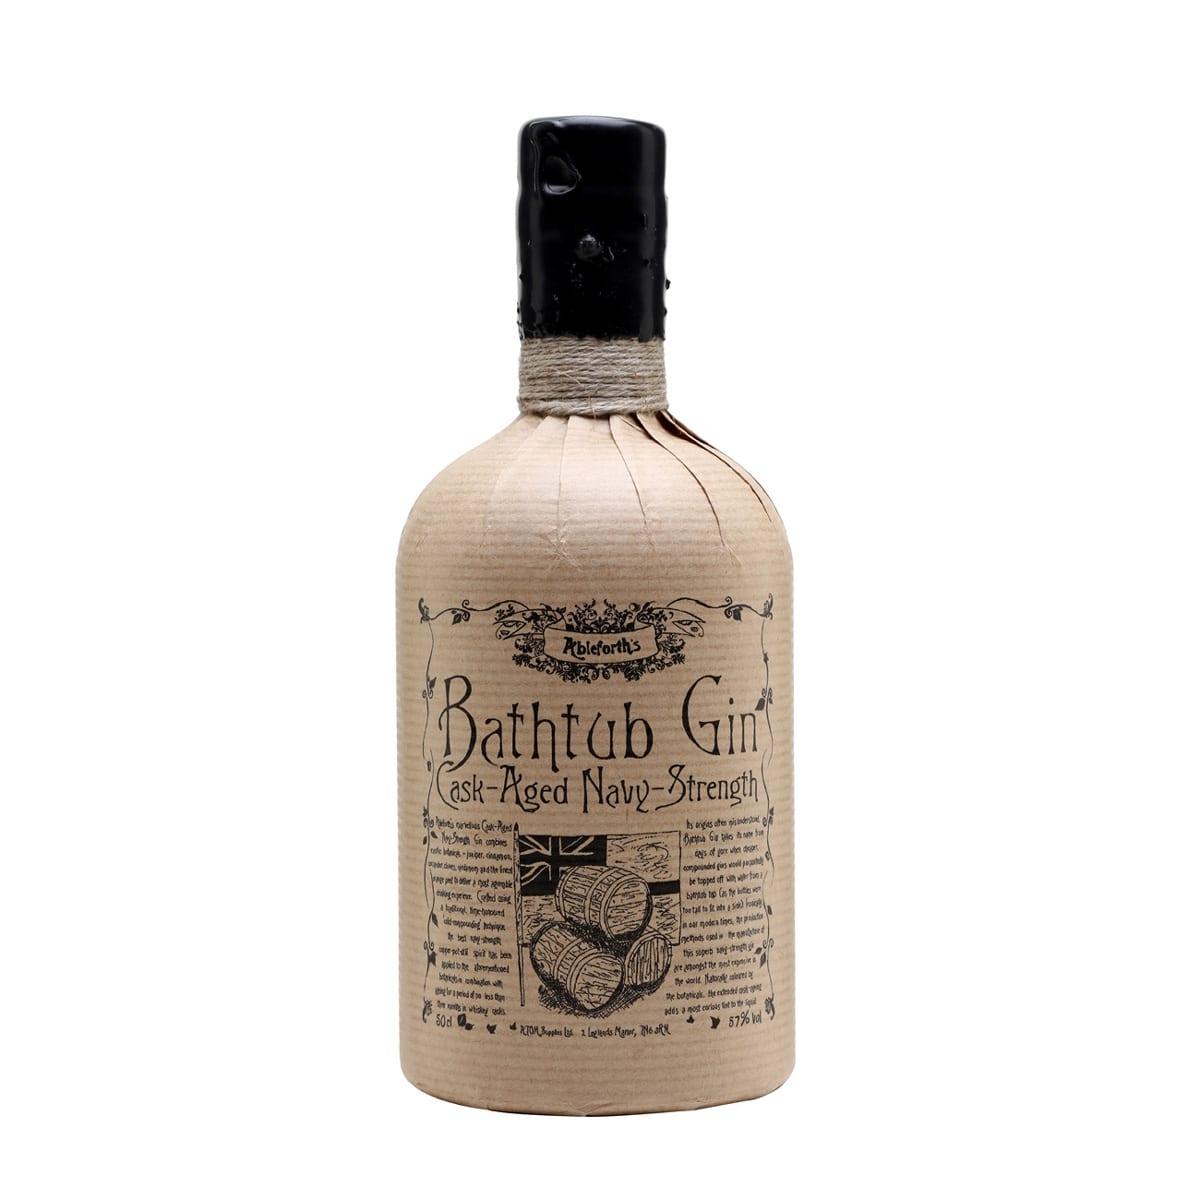 Bathtub Gin – Cask-Aged Navy-Strength